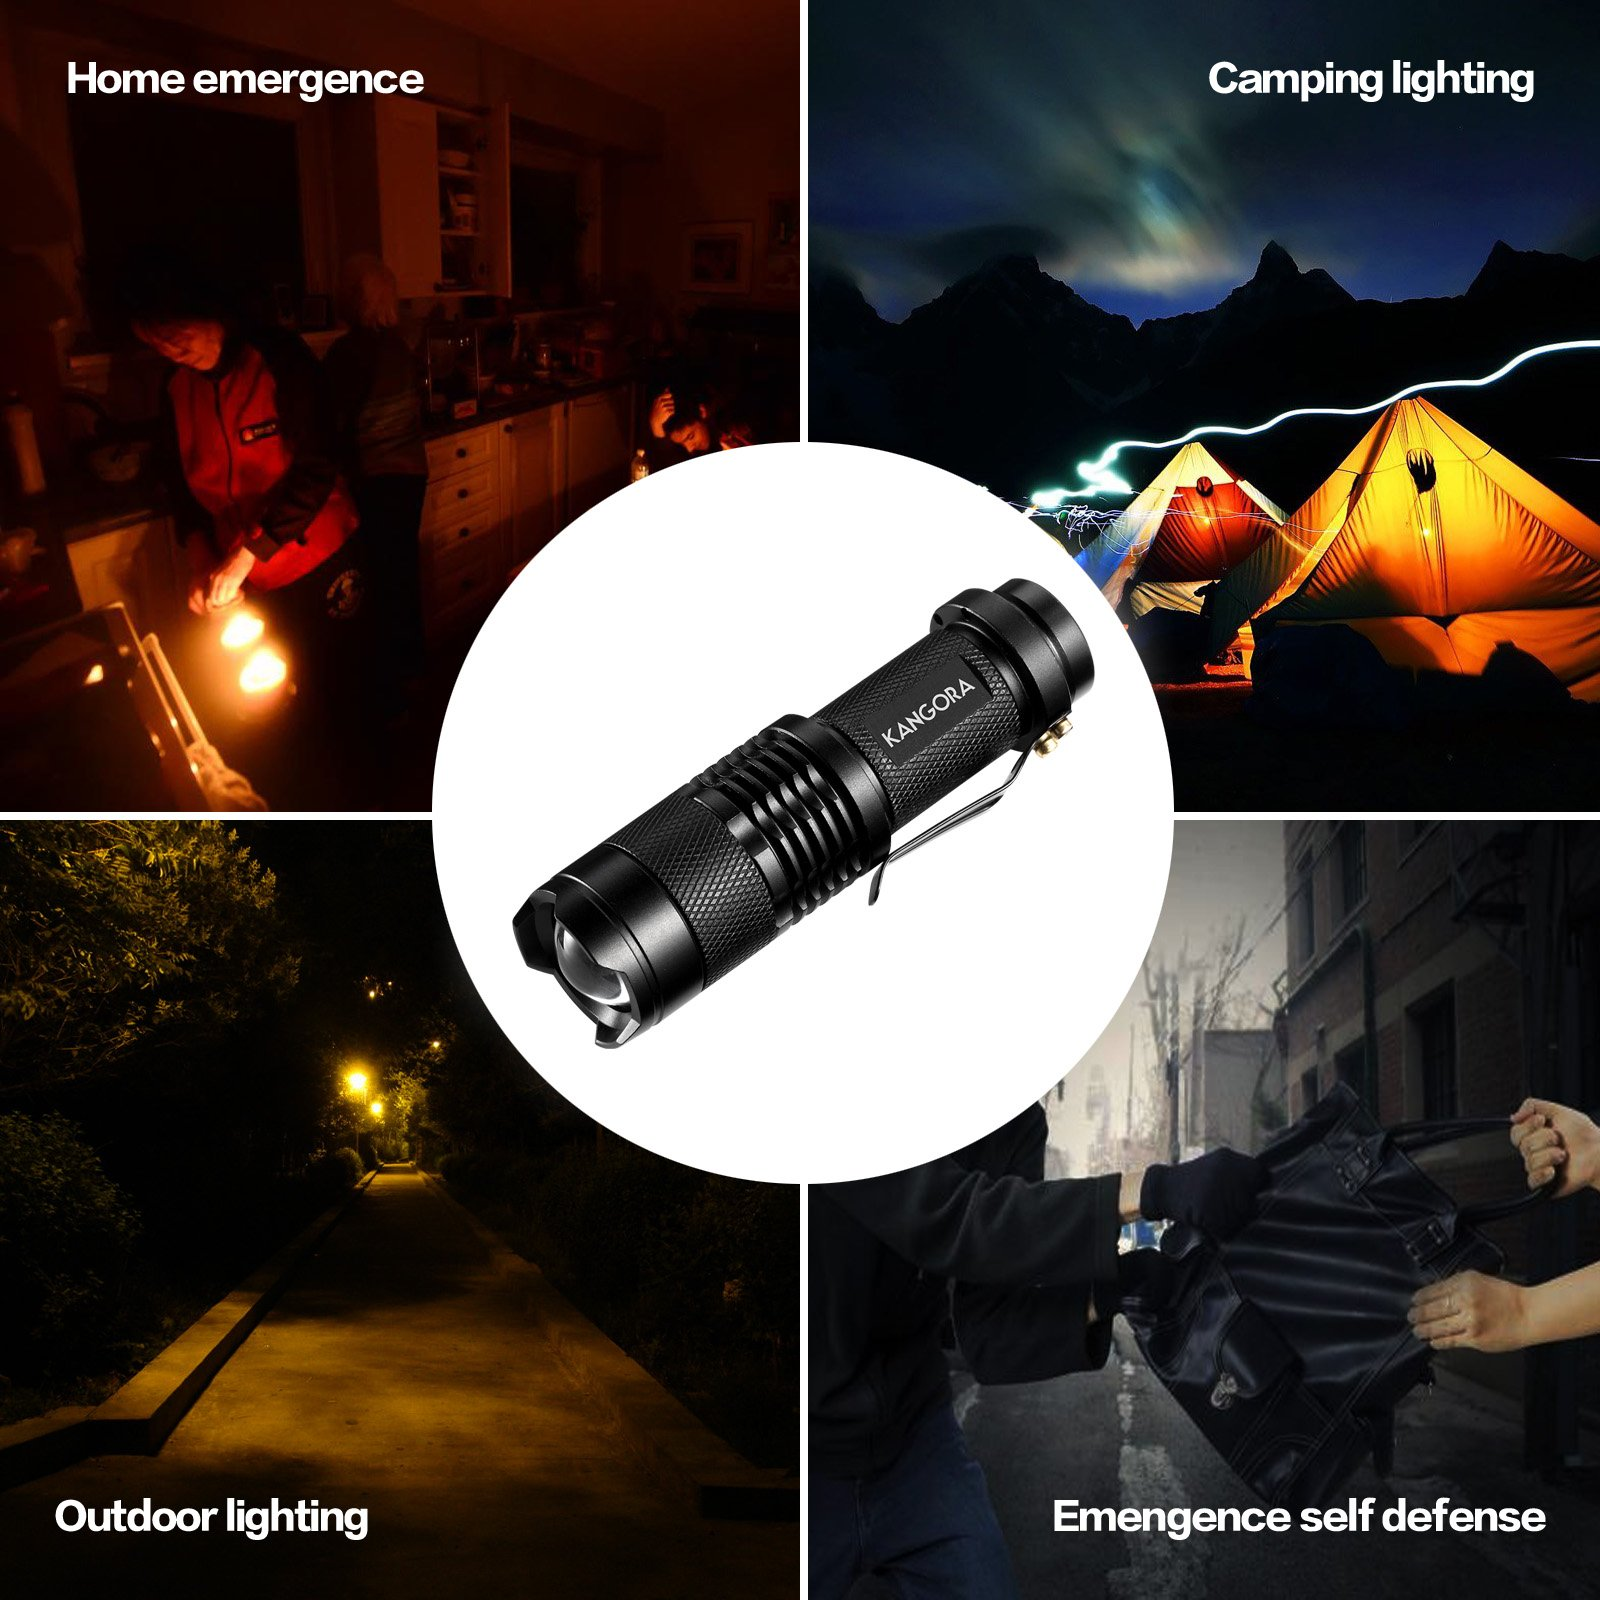 KANGORA Pack of 5, 300 Lumens LED Tactical Mini Handheld Flashlights 3 Light Modes by KANGORA (Image #6)